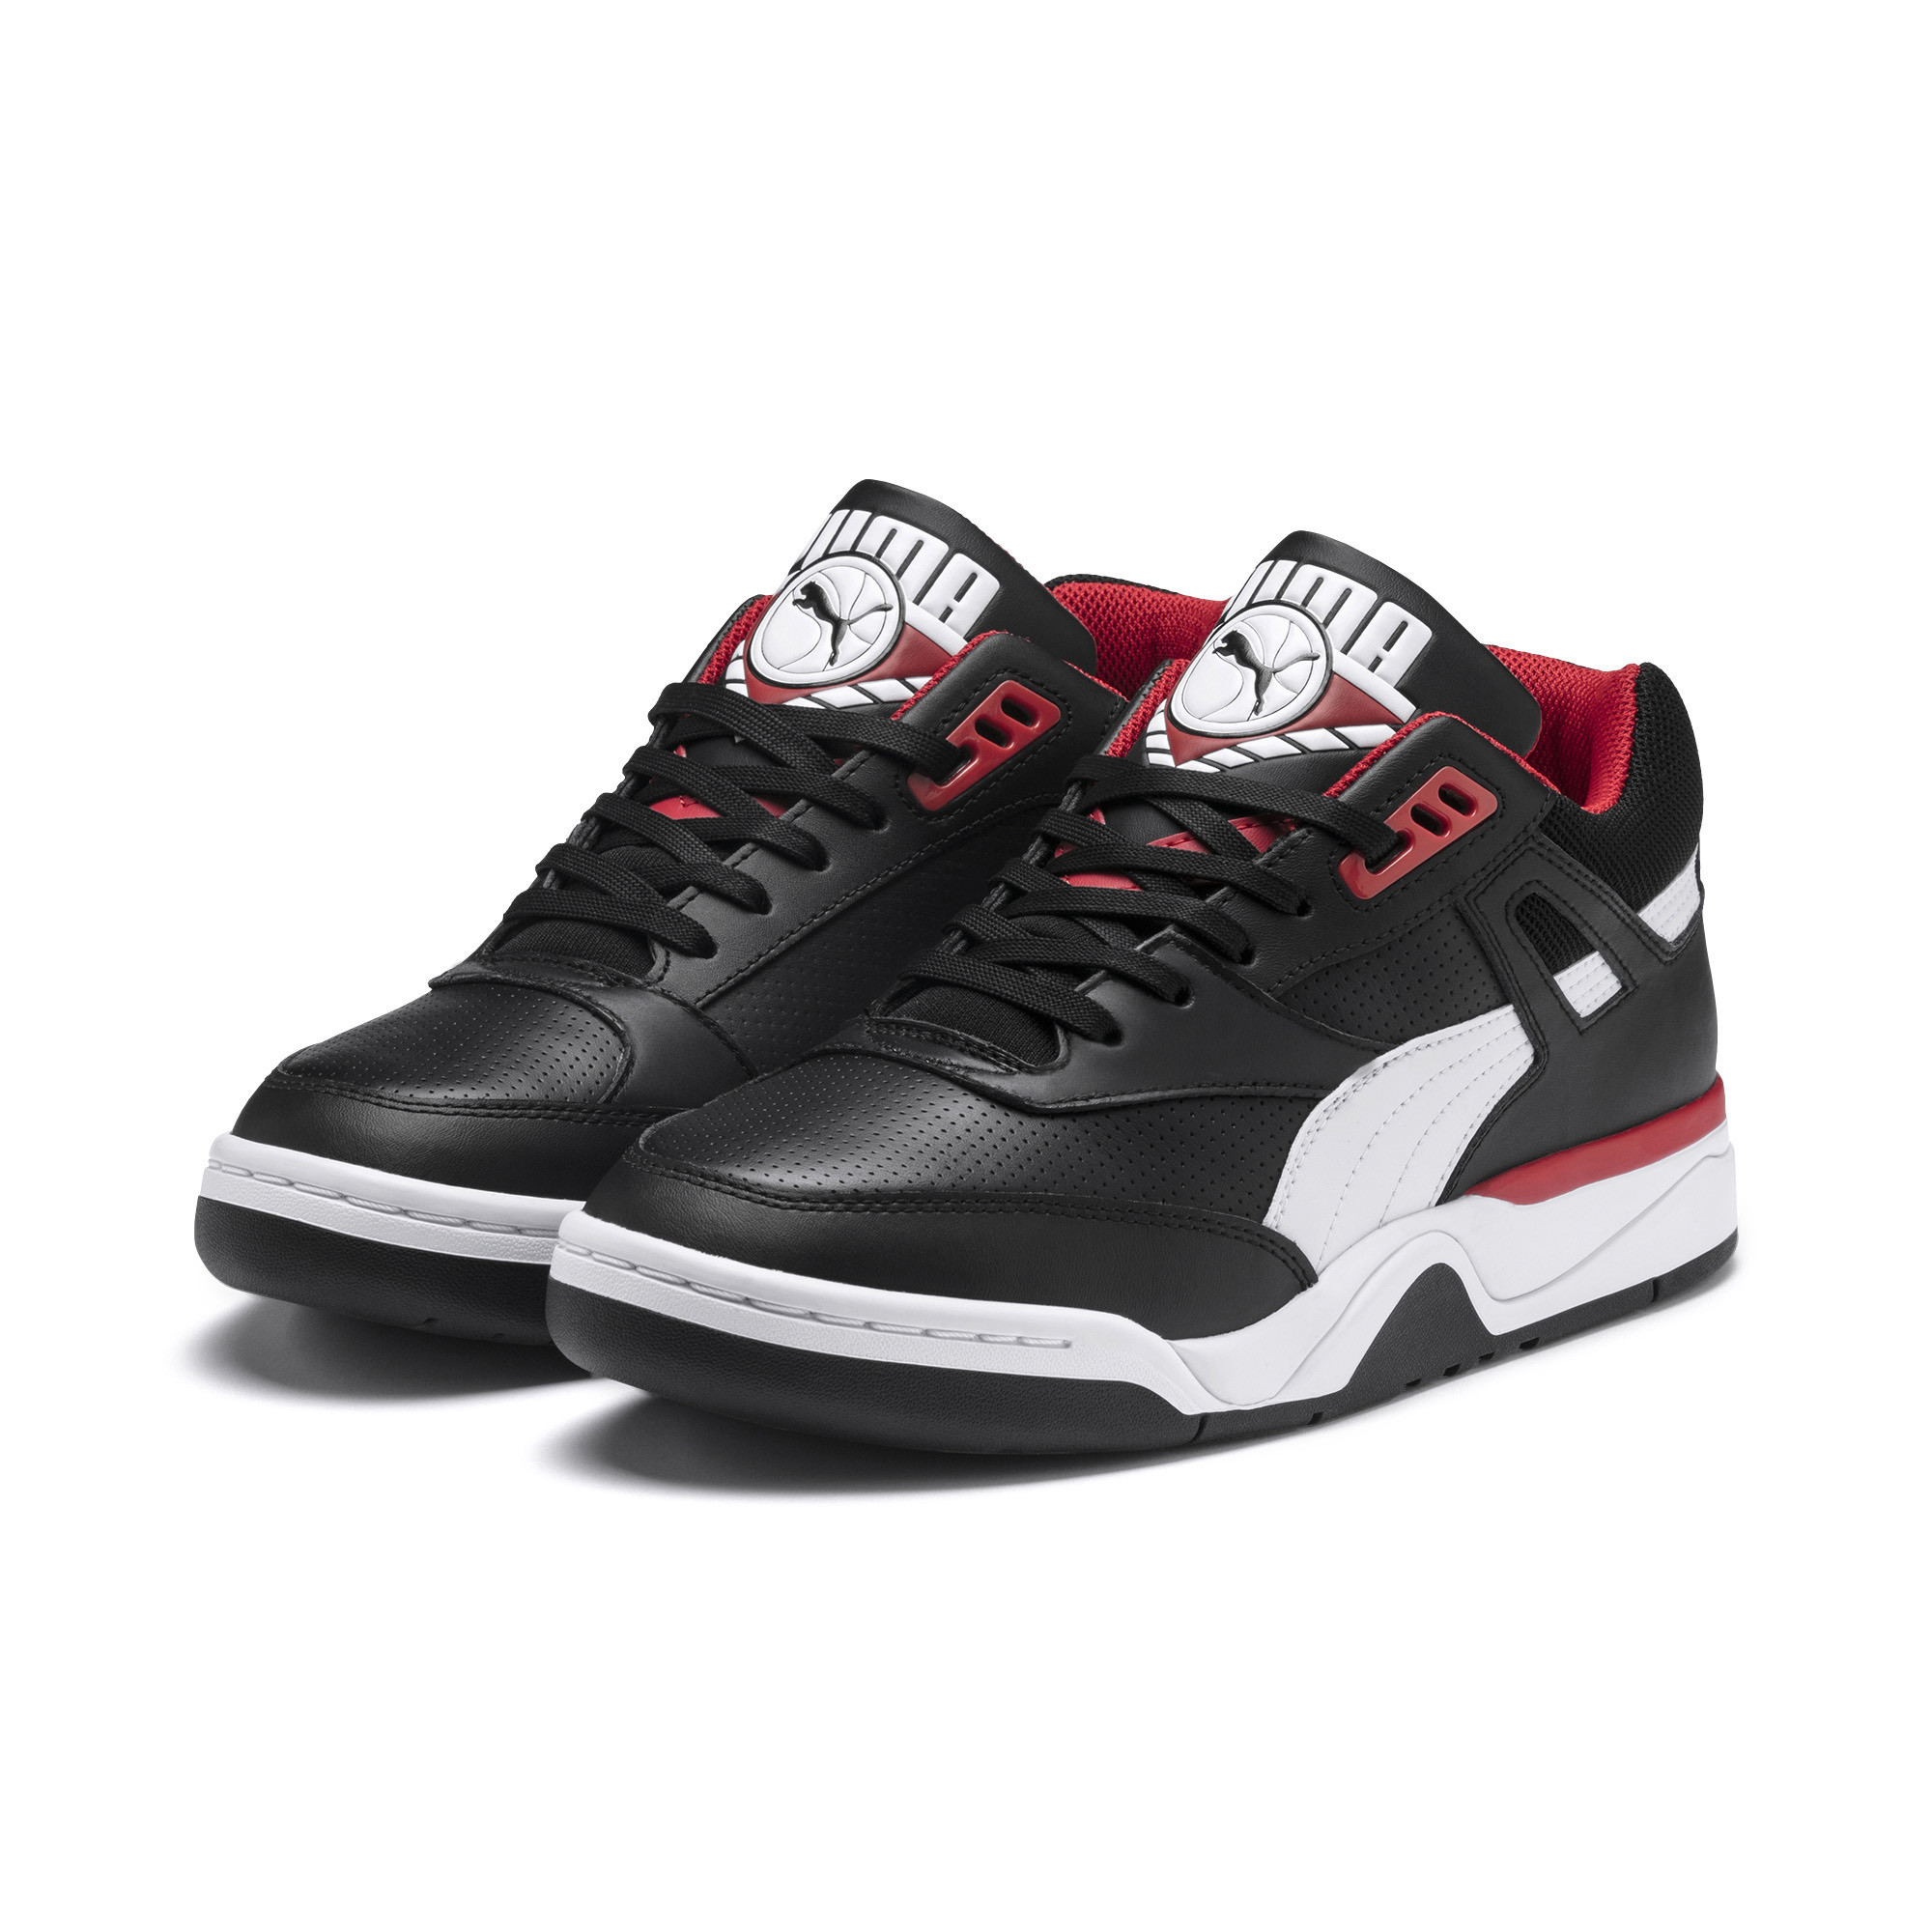 Indexbild 8 - PUMA Palace Guard Sneaker Unisex Schuhe Sport Classics Neu